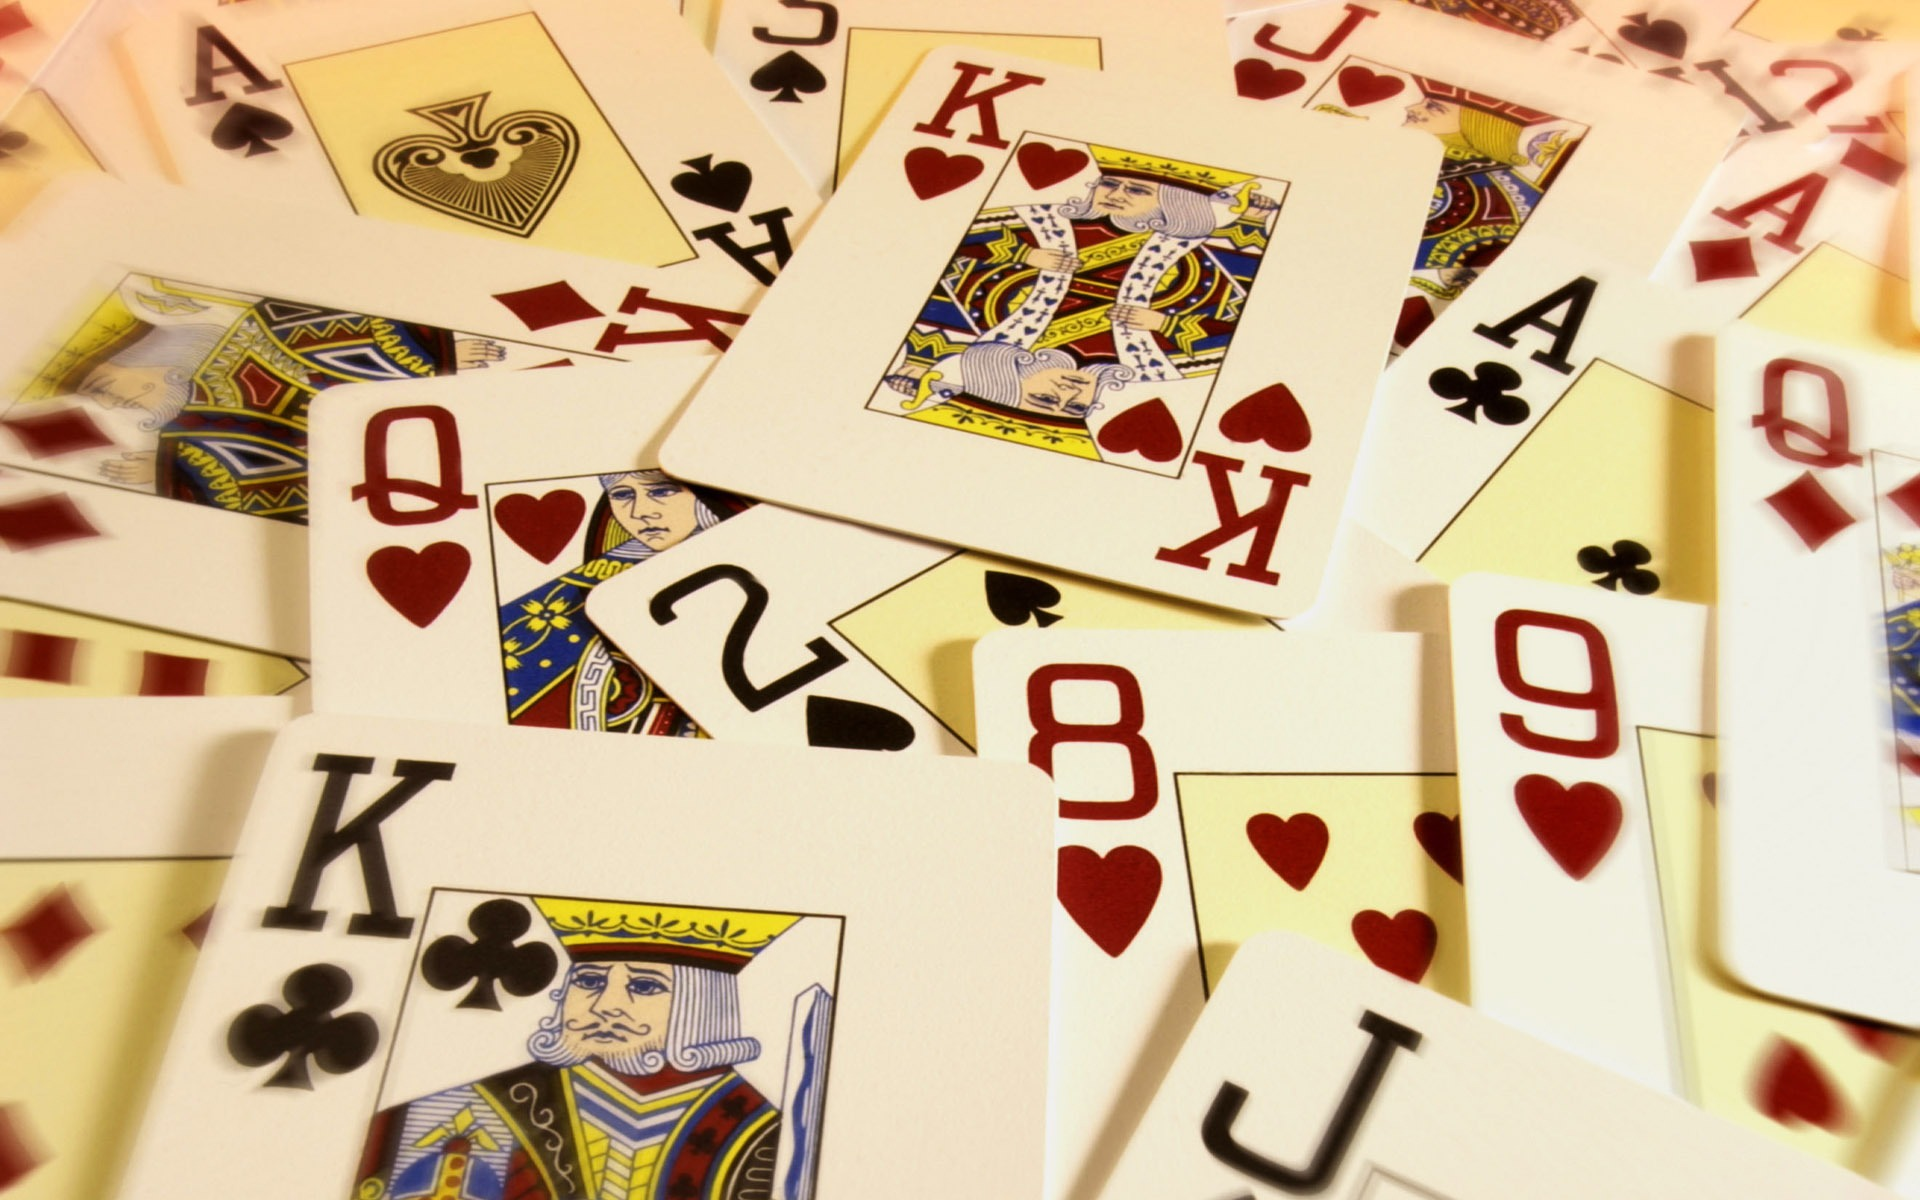 13-cards-rummy